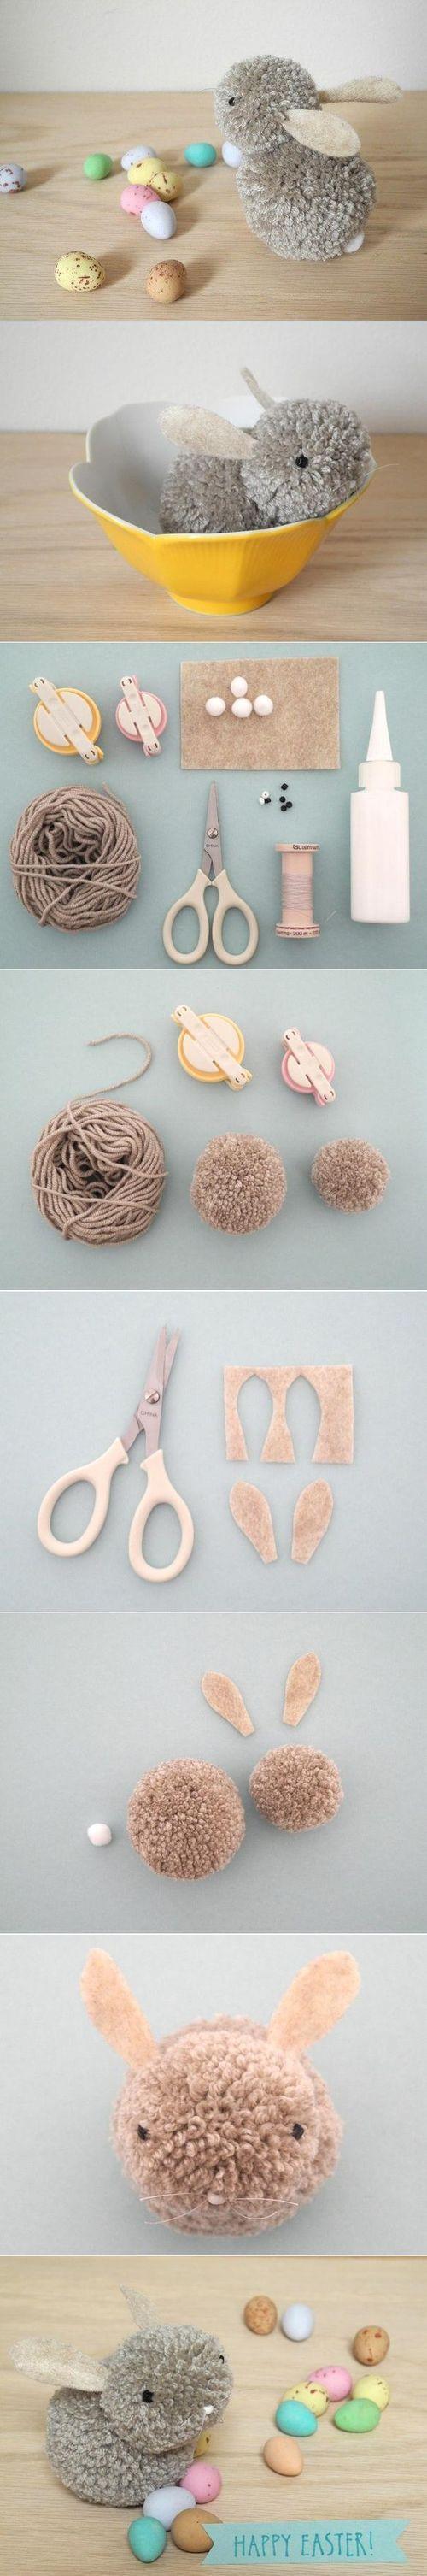 DIY Pom Pom Bunny DIY Projects / UsefulDIY.com